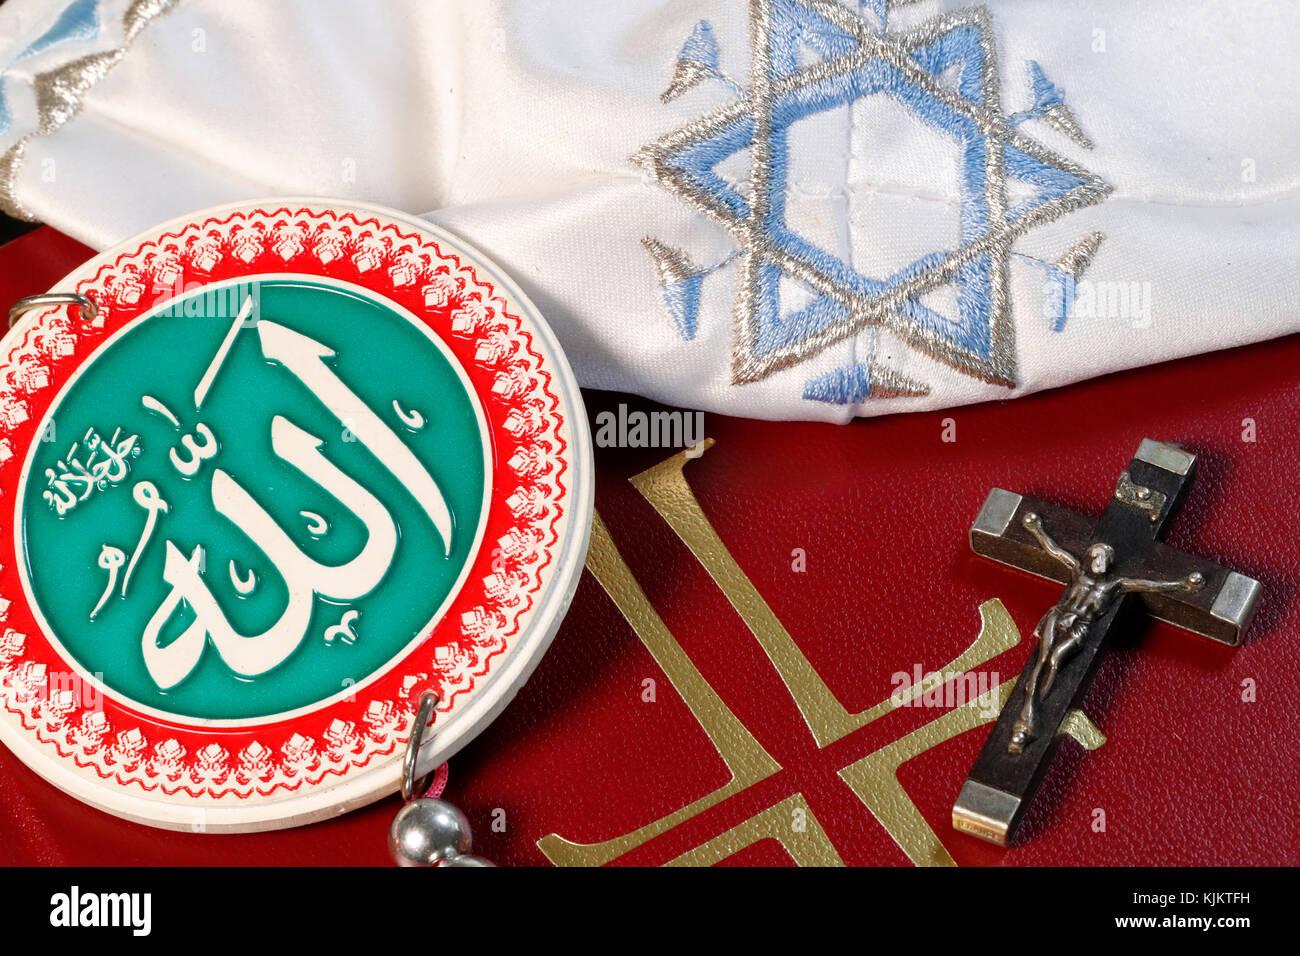 Christianity Islam and Judaism : 3 monotheistic religions. Interfaith symbols : bible, crucifix, Allah Monogram, - Stock Image